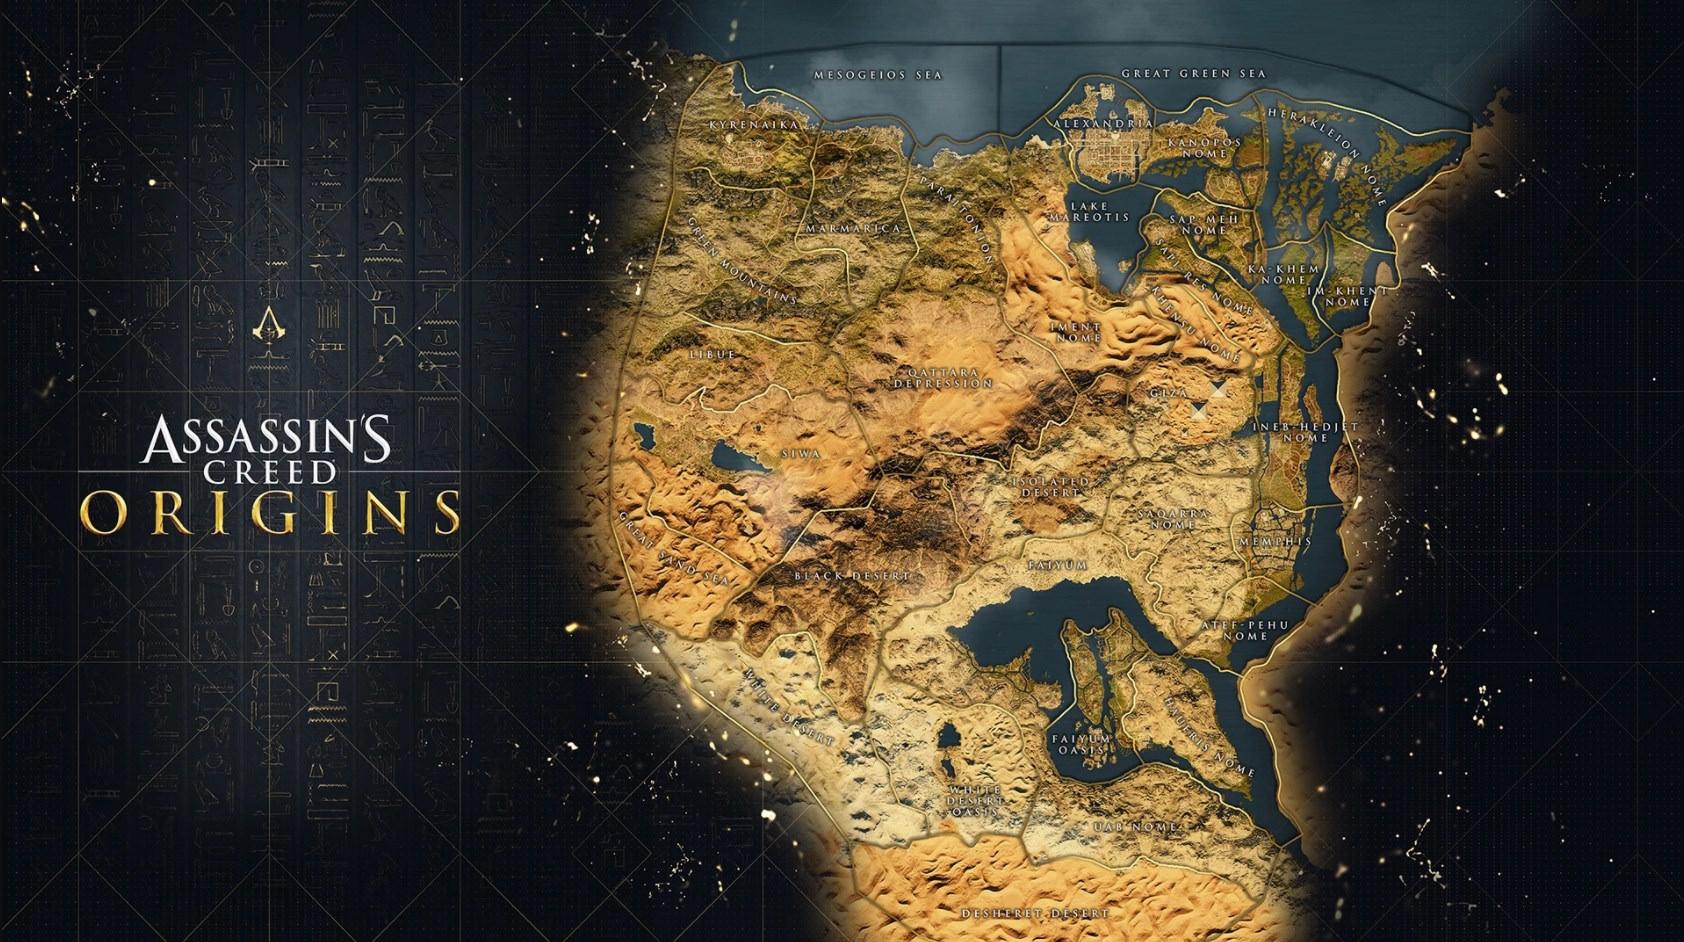 Grece Carte Roblox Assassin S Creed Origins La Carte Du Monde Breakflip Actualite Guides Et Astuces Esport Et Jeu Video